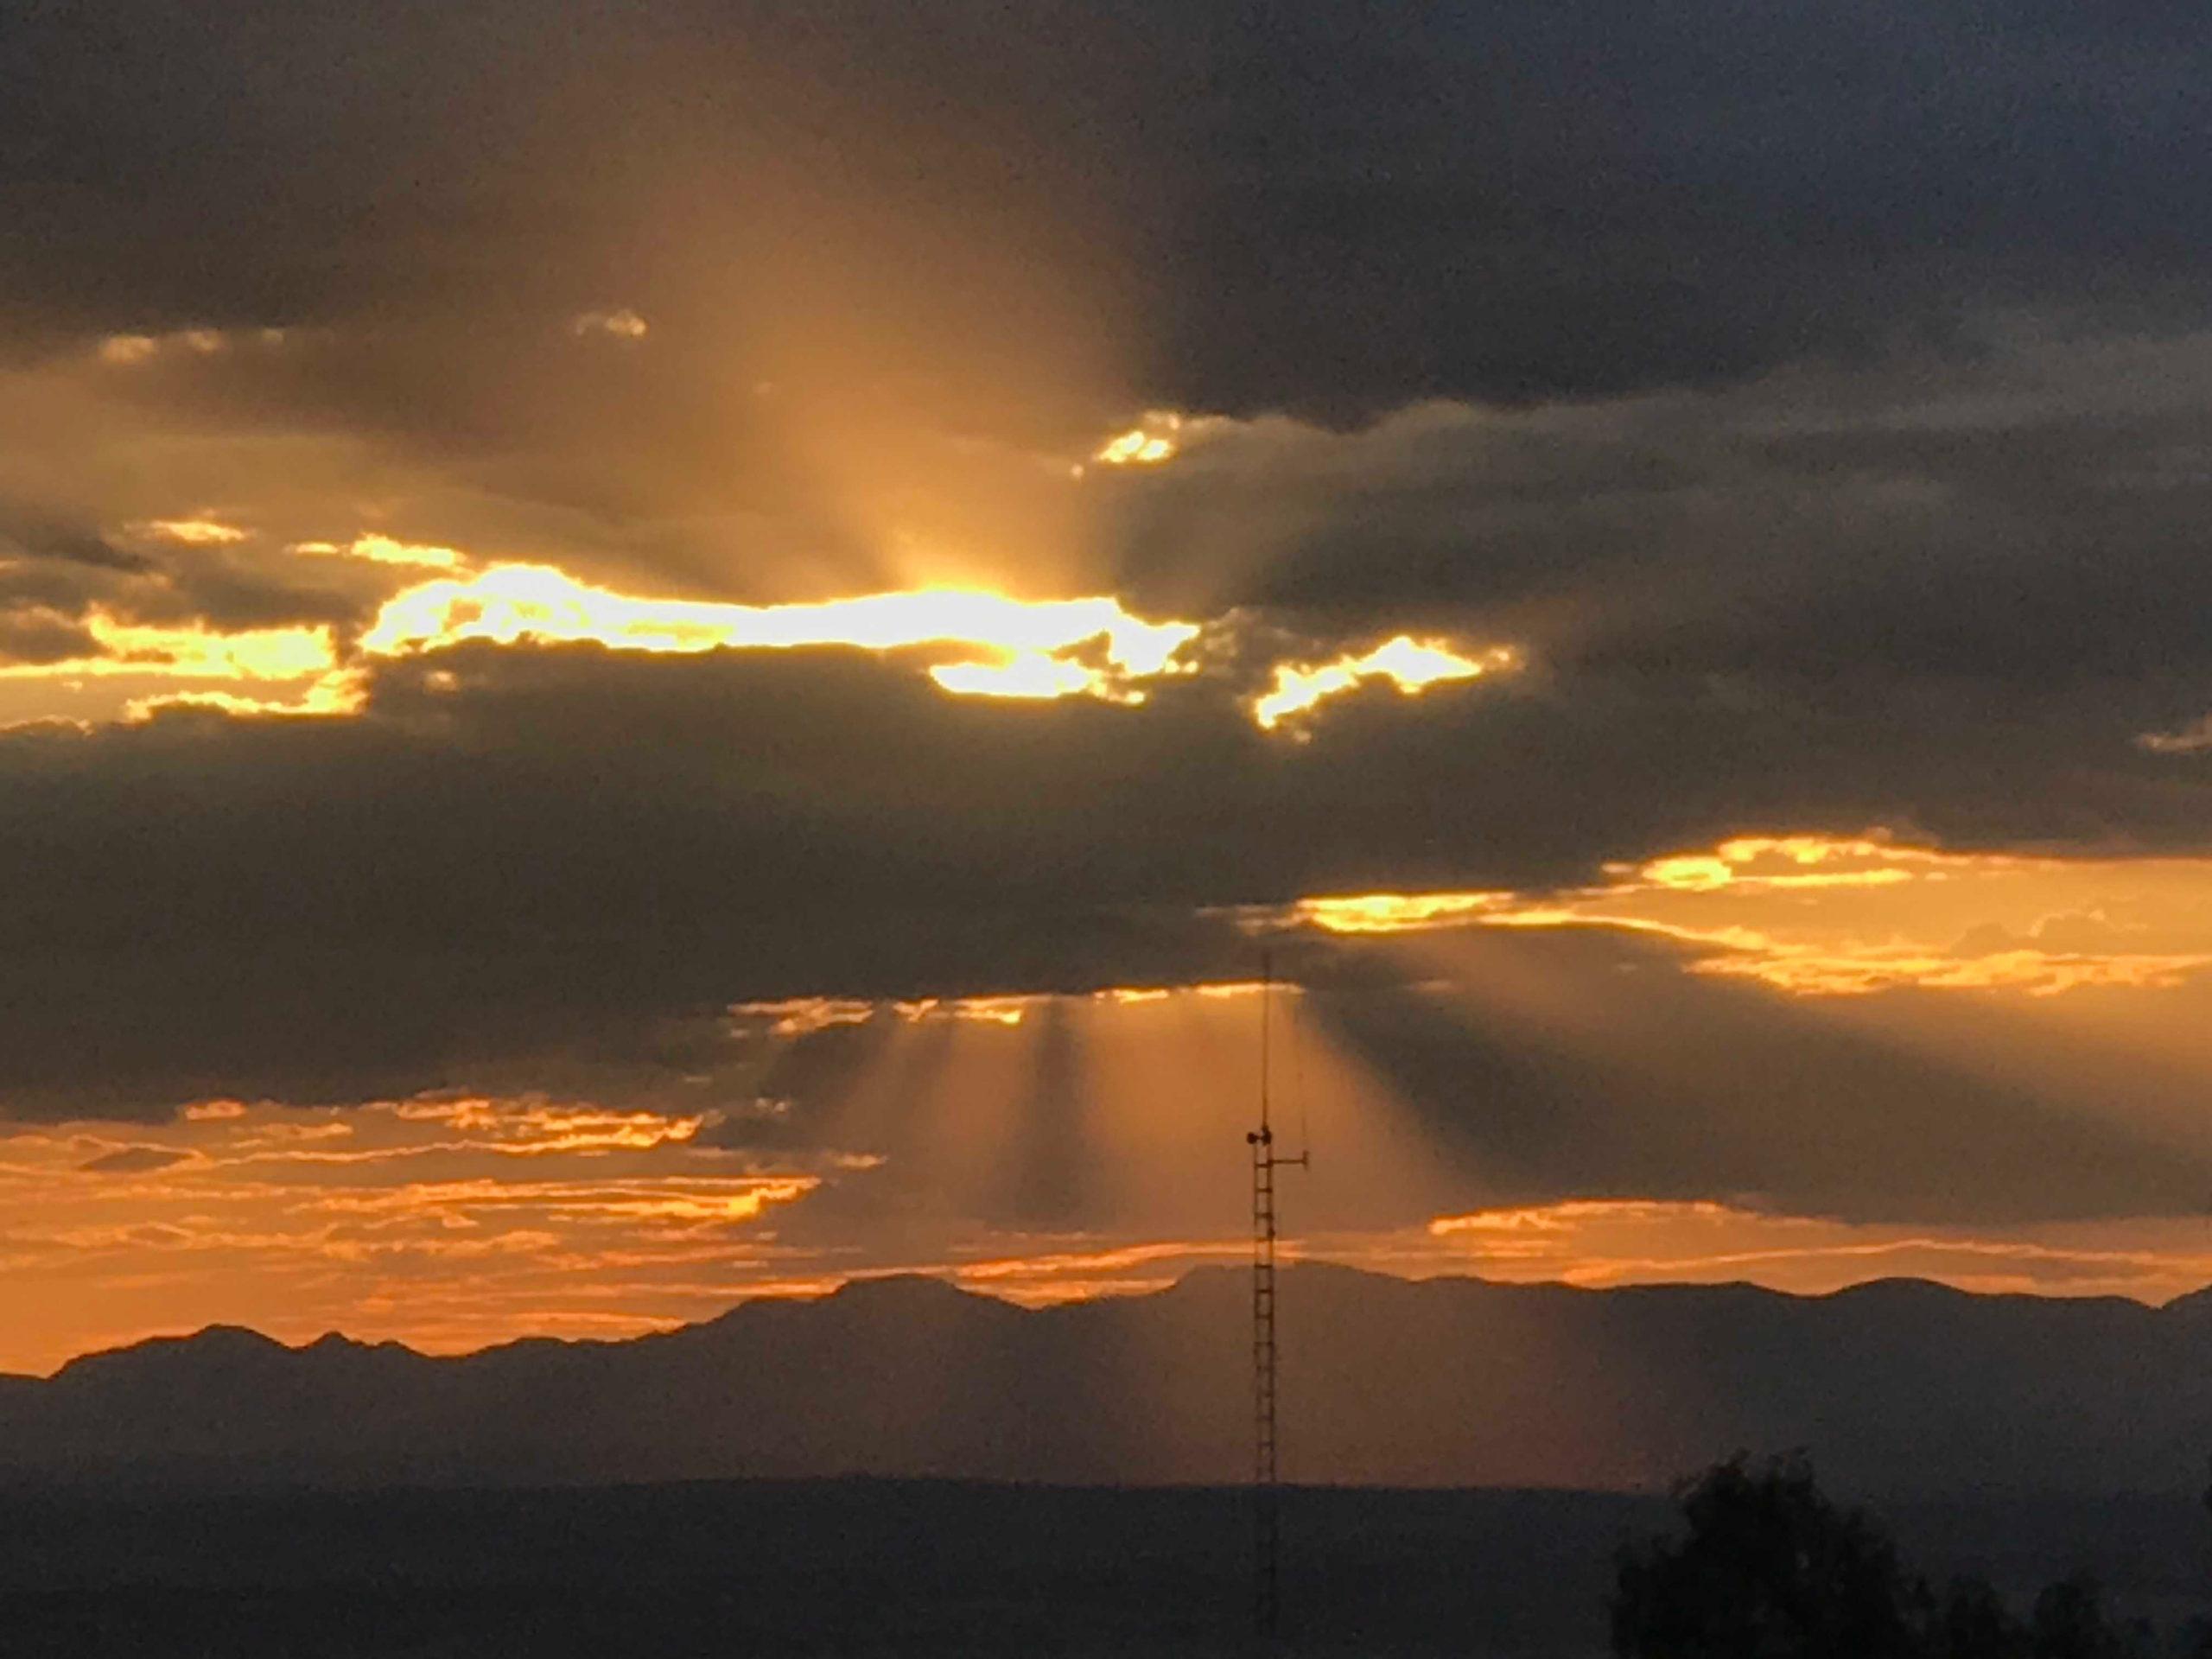 Sunset over San Miguel de Allende